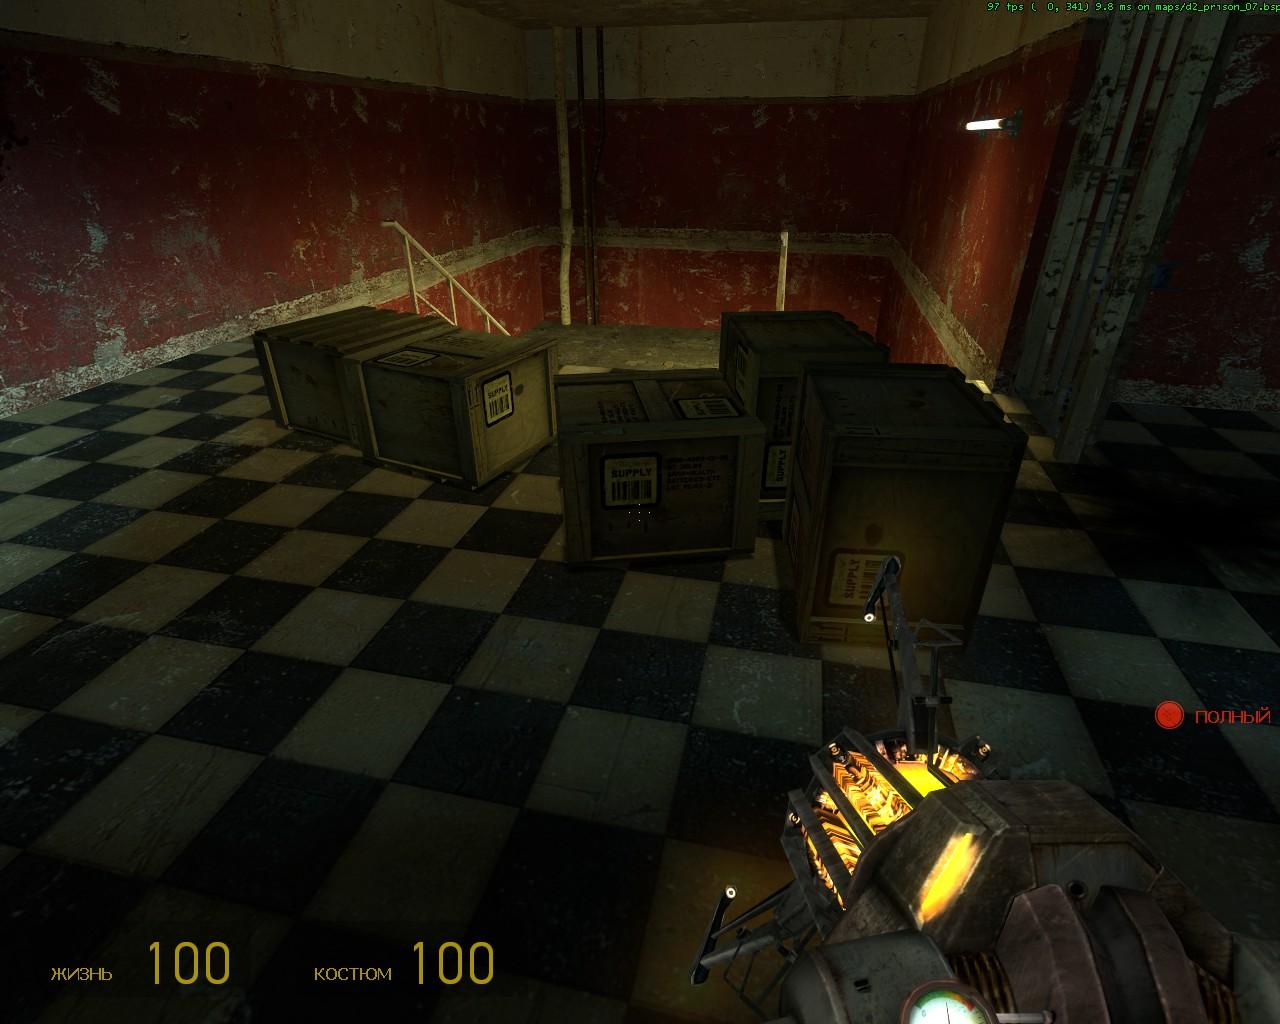 d2_prison_070012.jpg - Half-Life 2